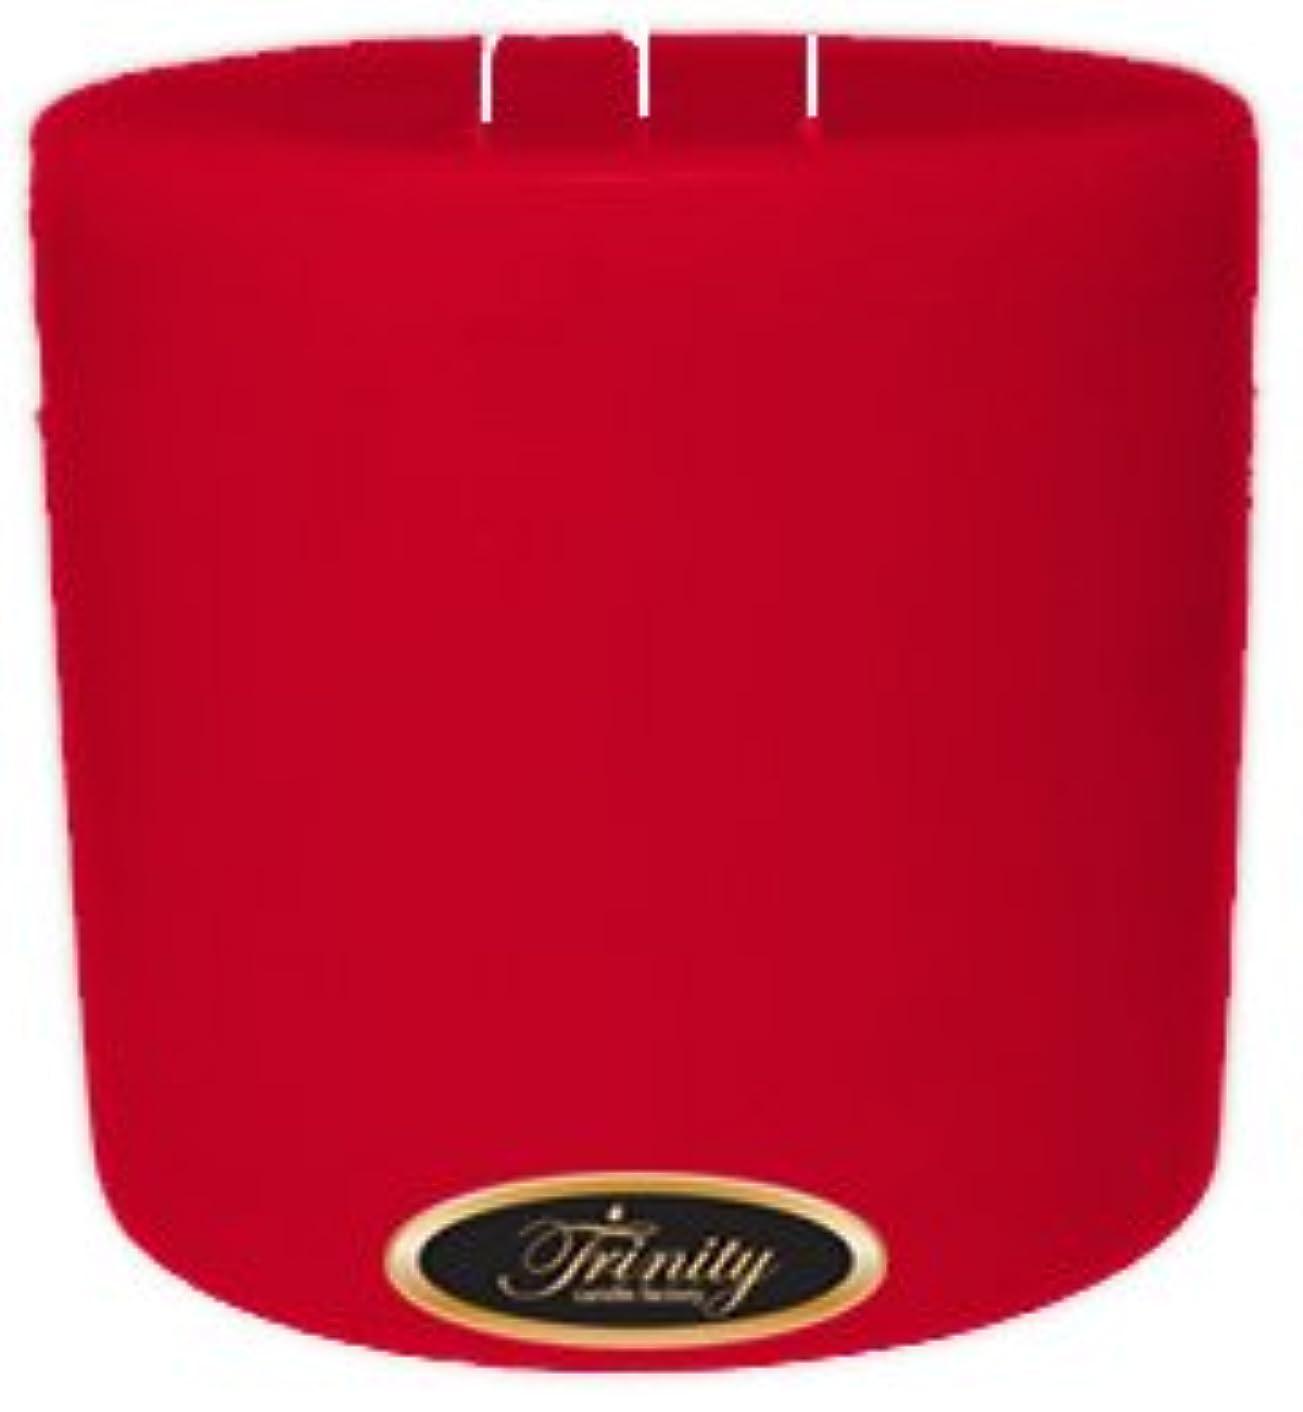 脱獄光沢彼Trinity Candle工場 – Holly Berry – Pillar Candle – 6 x 6